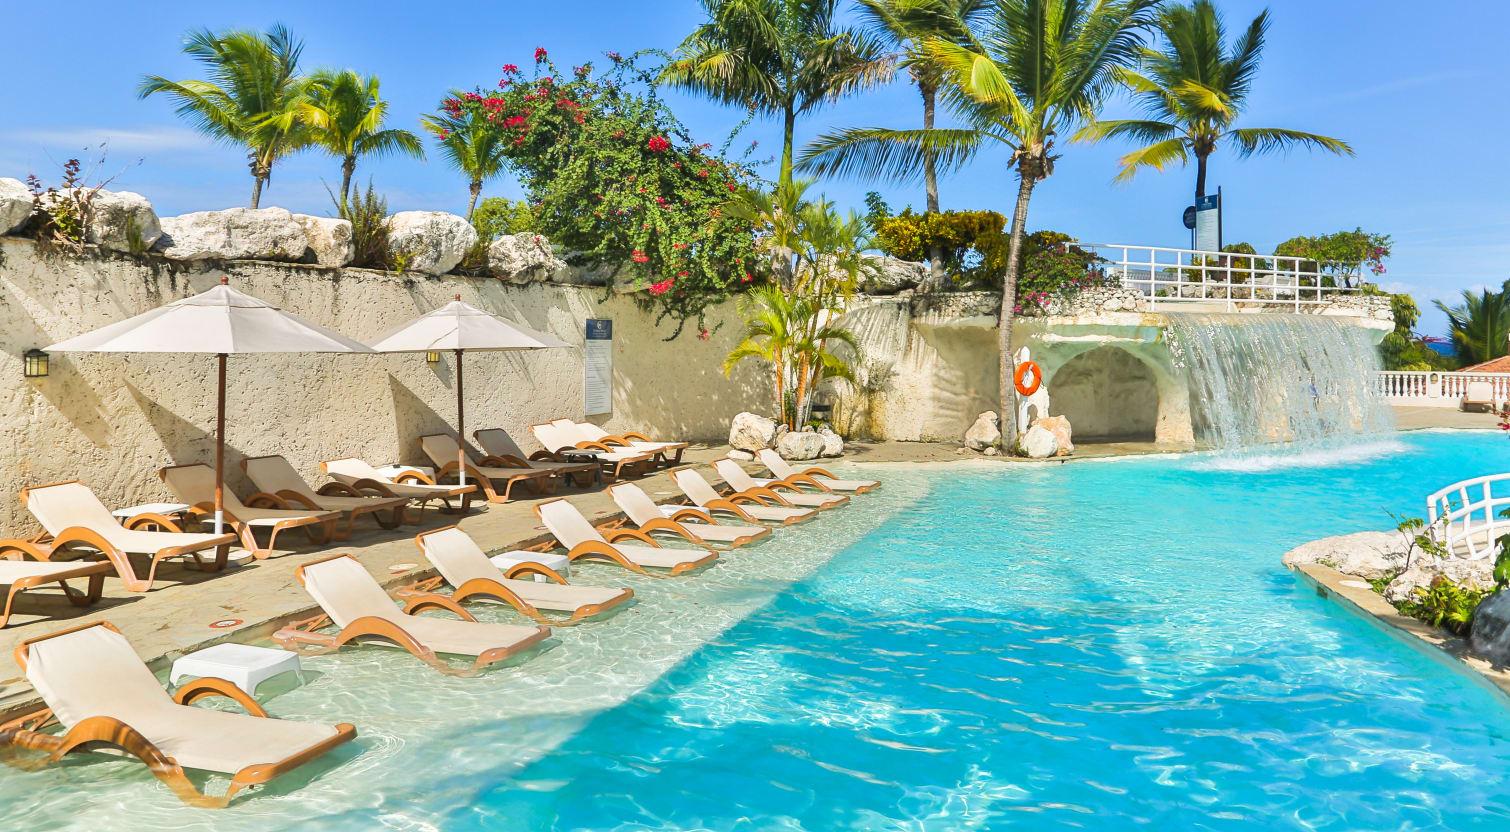 Cofresi Palm Beach Spa Resort Weddings Honeymoons Dominican Republic The Tourist